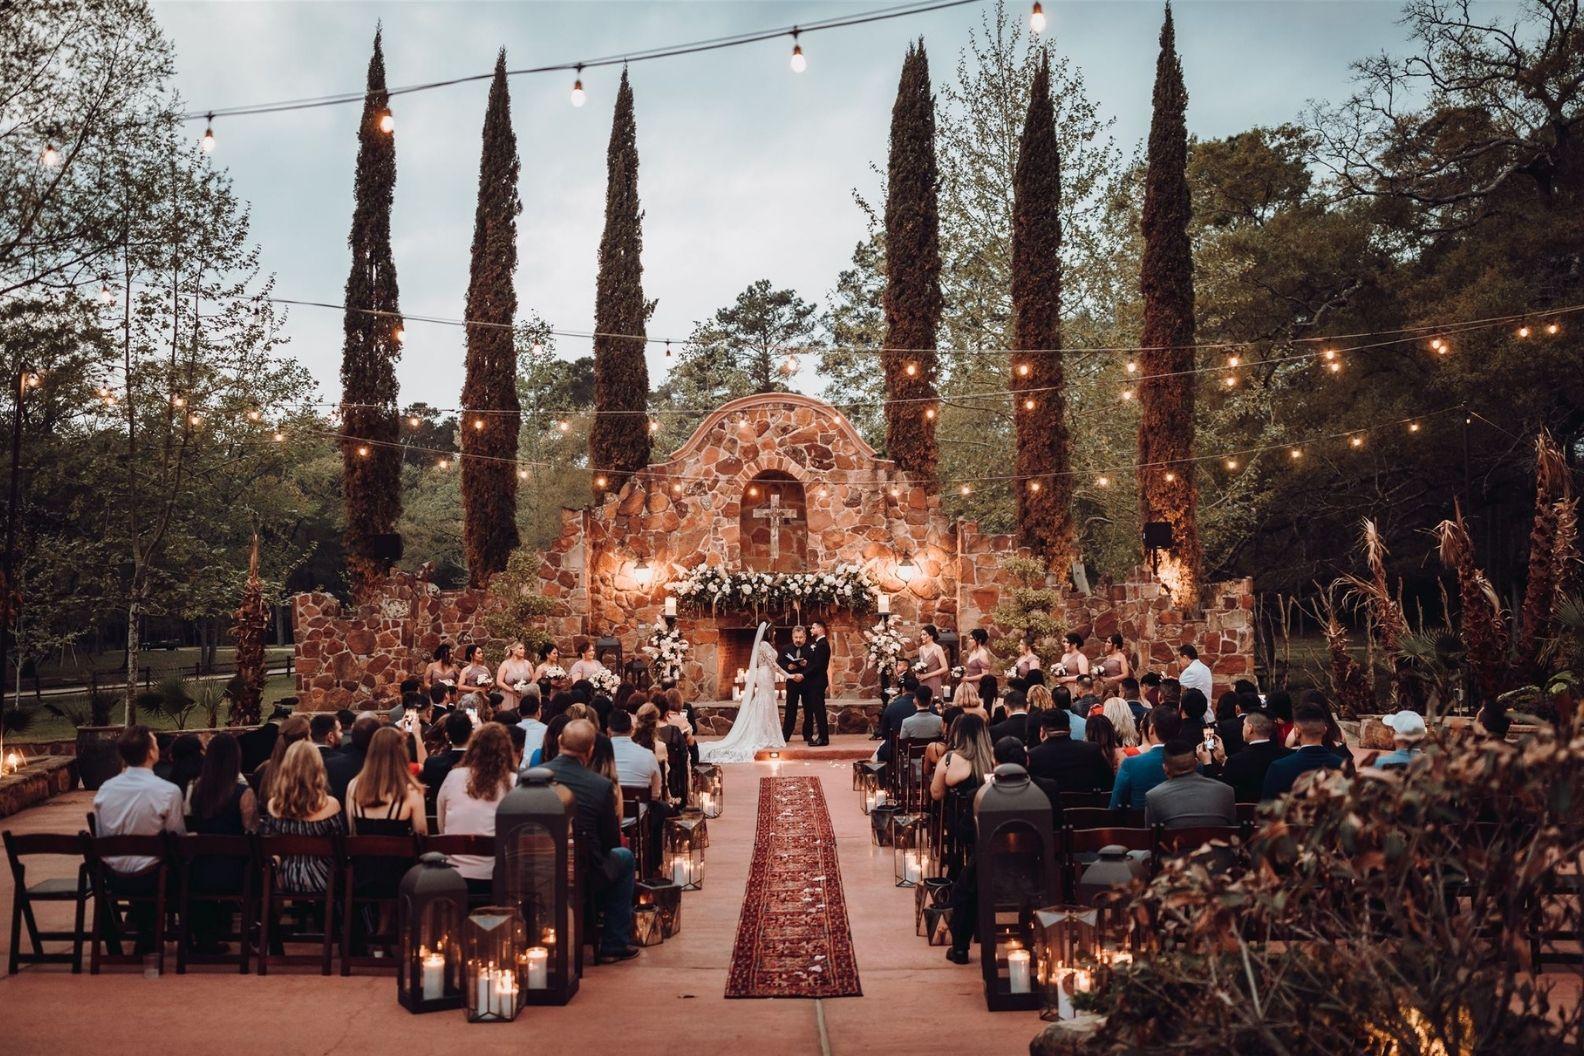 16 Samantha and Mario - Madera Estates Conroe Texas - Twilight Evening Outdoor Ceremony